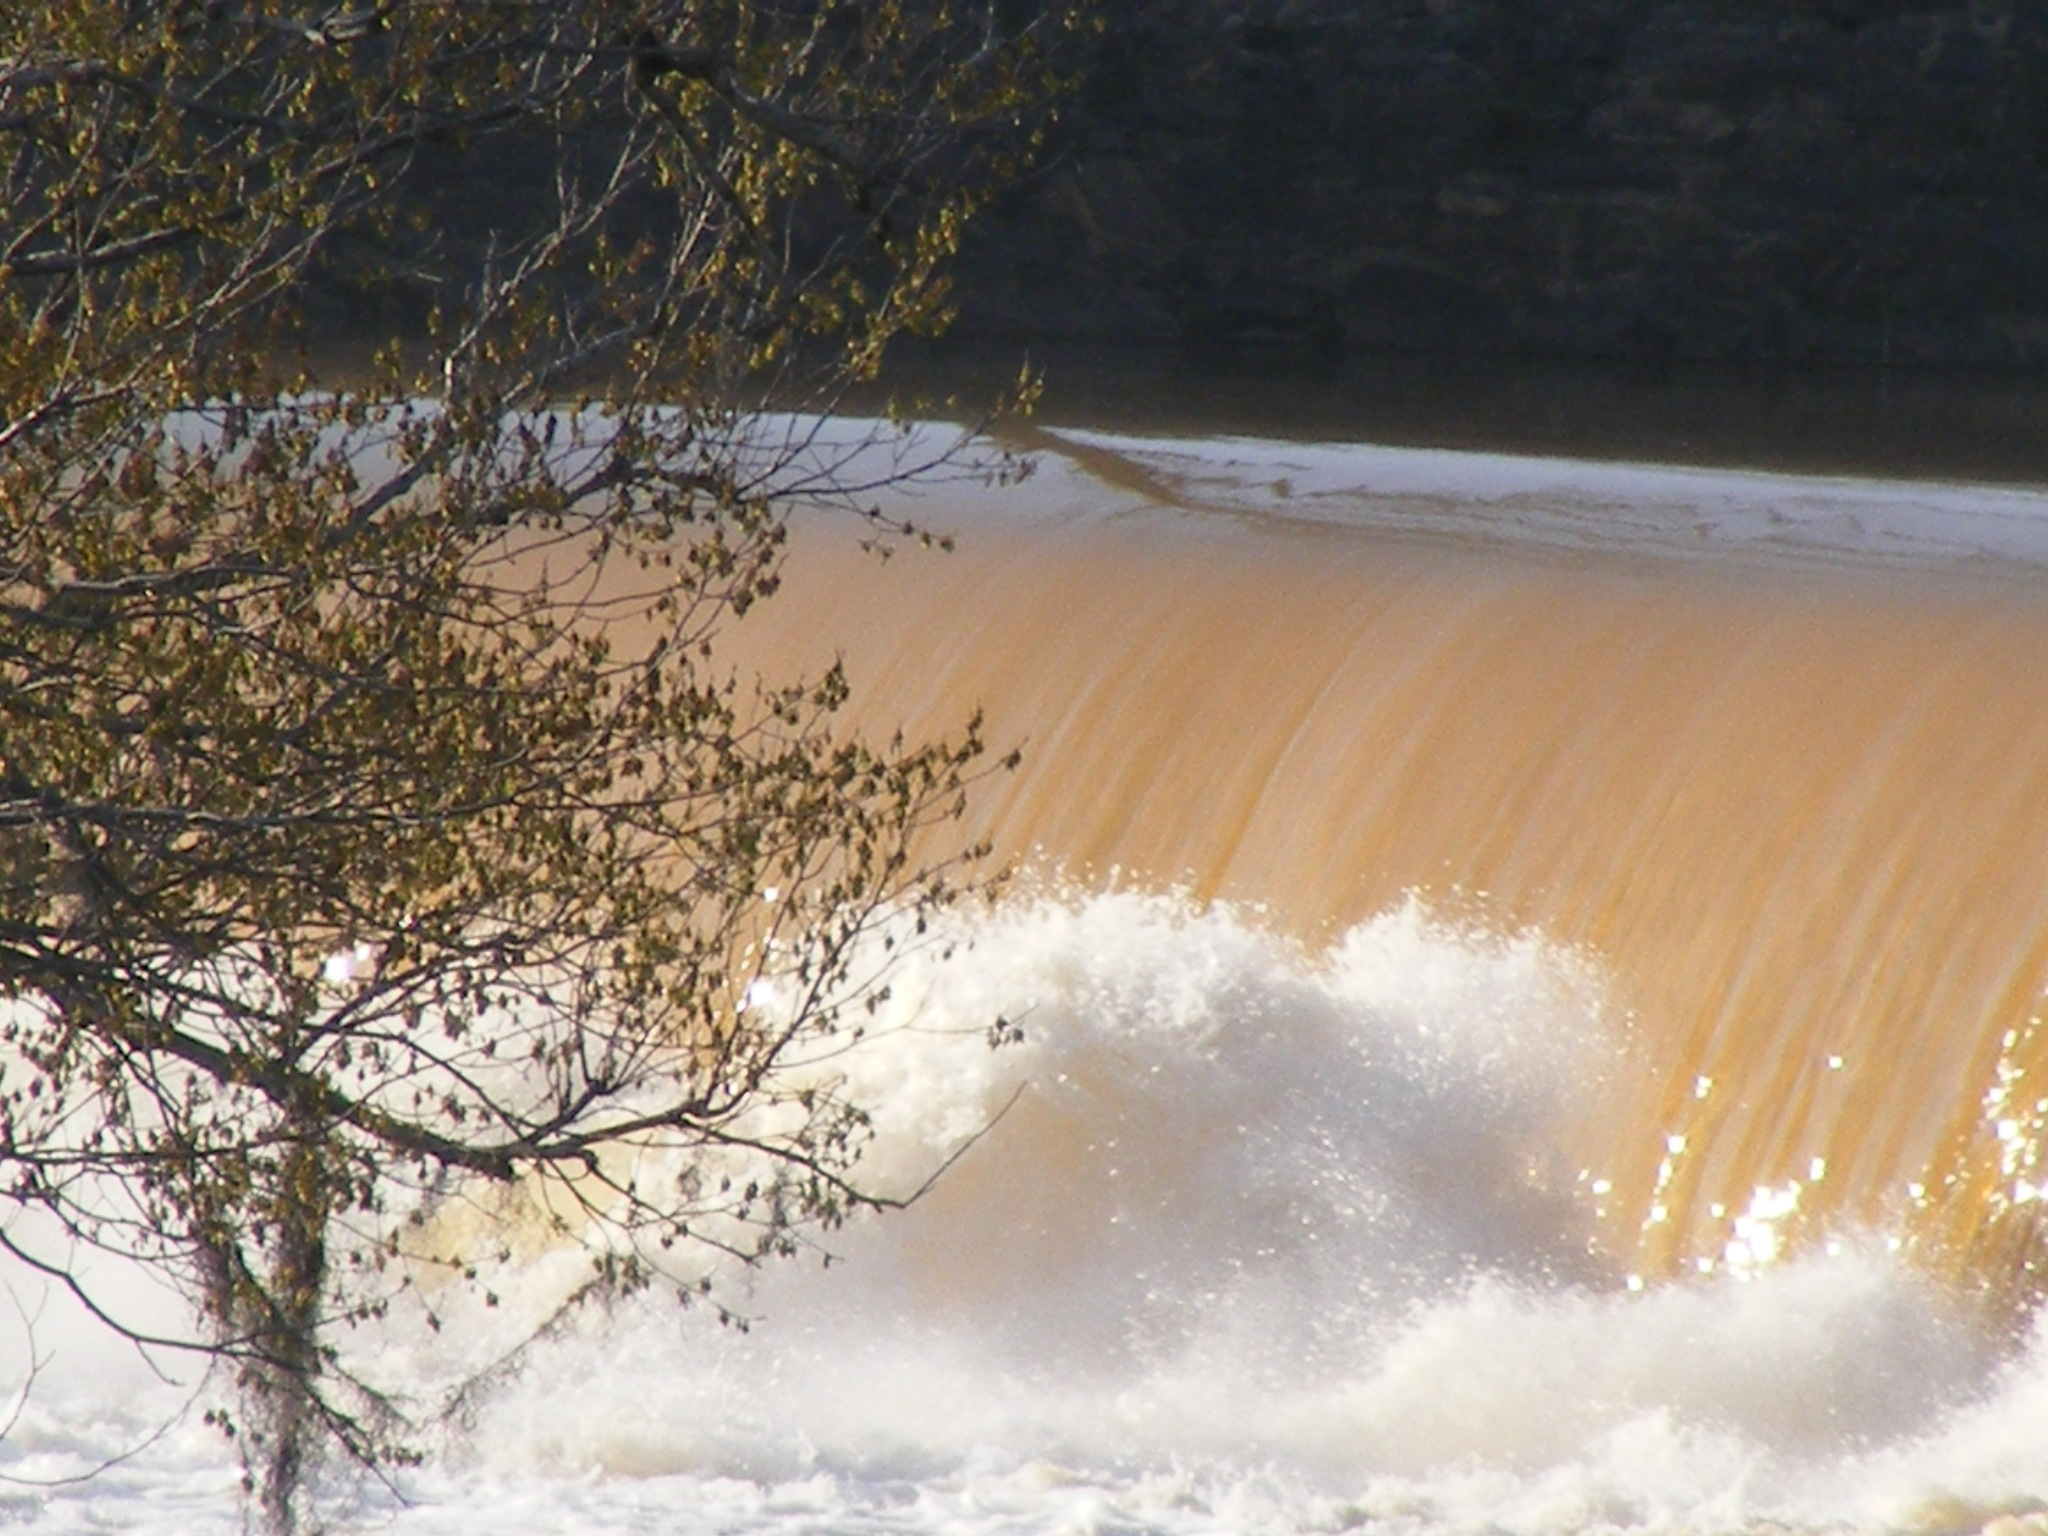 Falling Waters by Alex Ingram